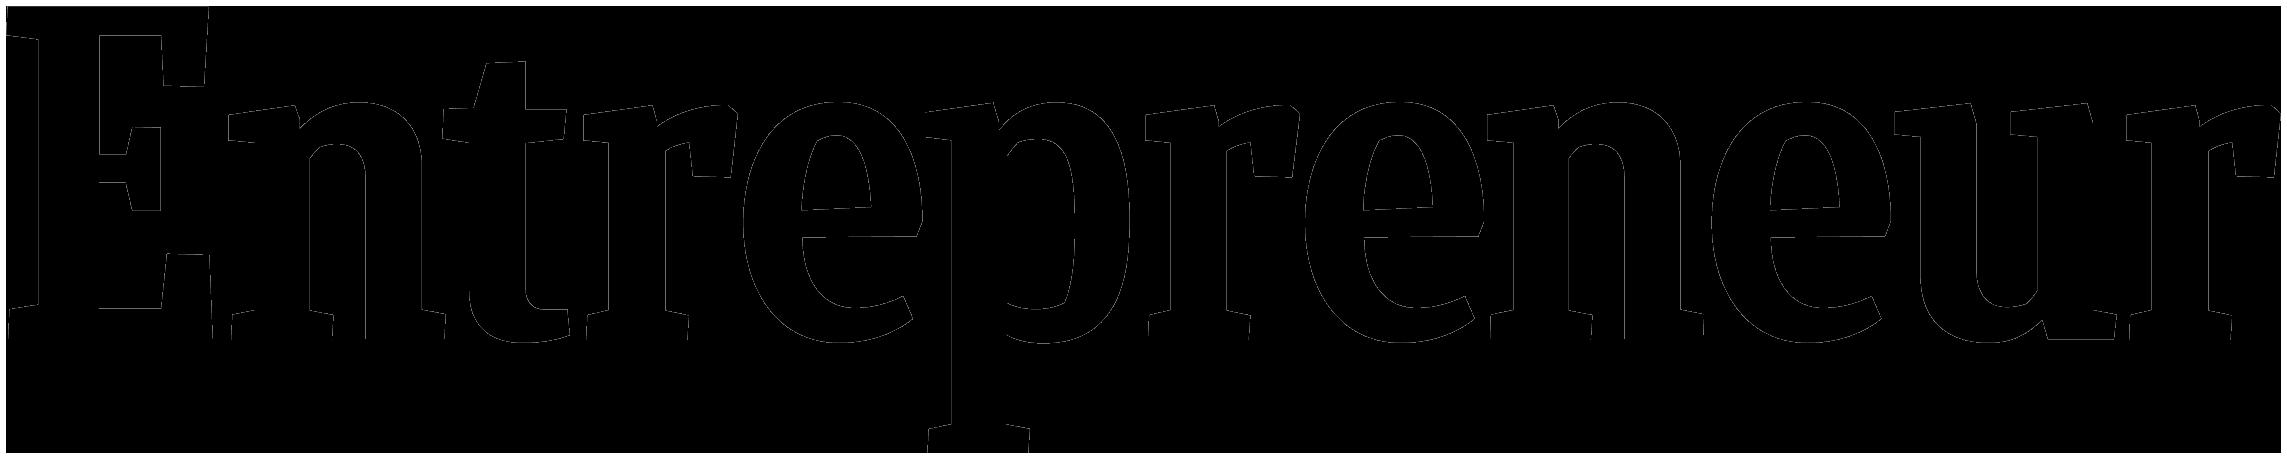 Enrepreneur logo